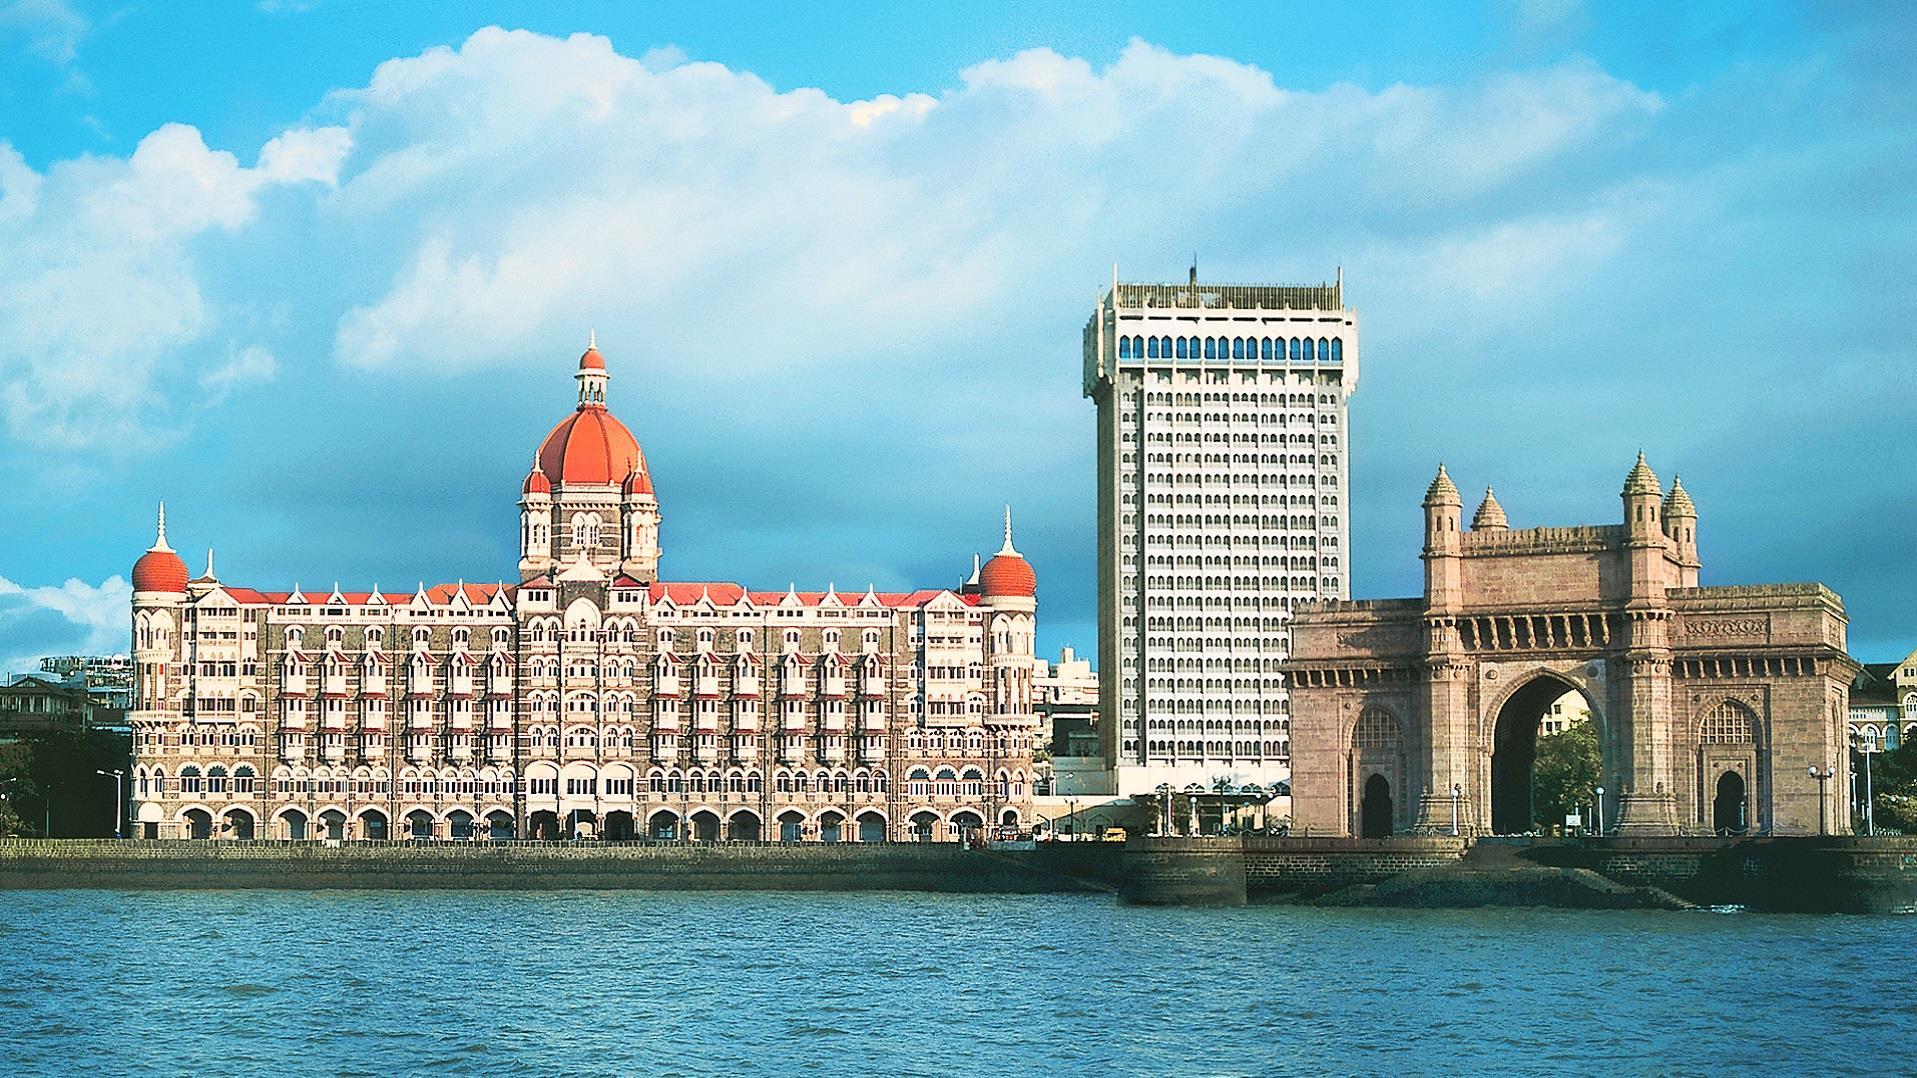 f0fbea85d0f54612b873170c6c110c56 LARGE - 5 Tempat Wisata di Mumbai Sering Dijadian Lookasi Shooting Film